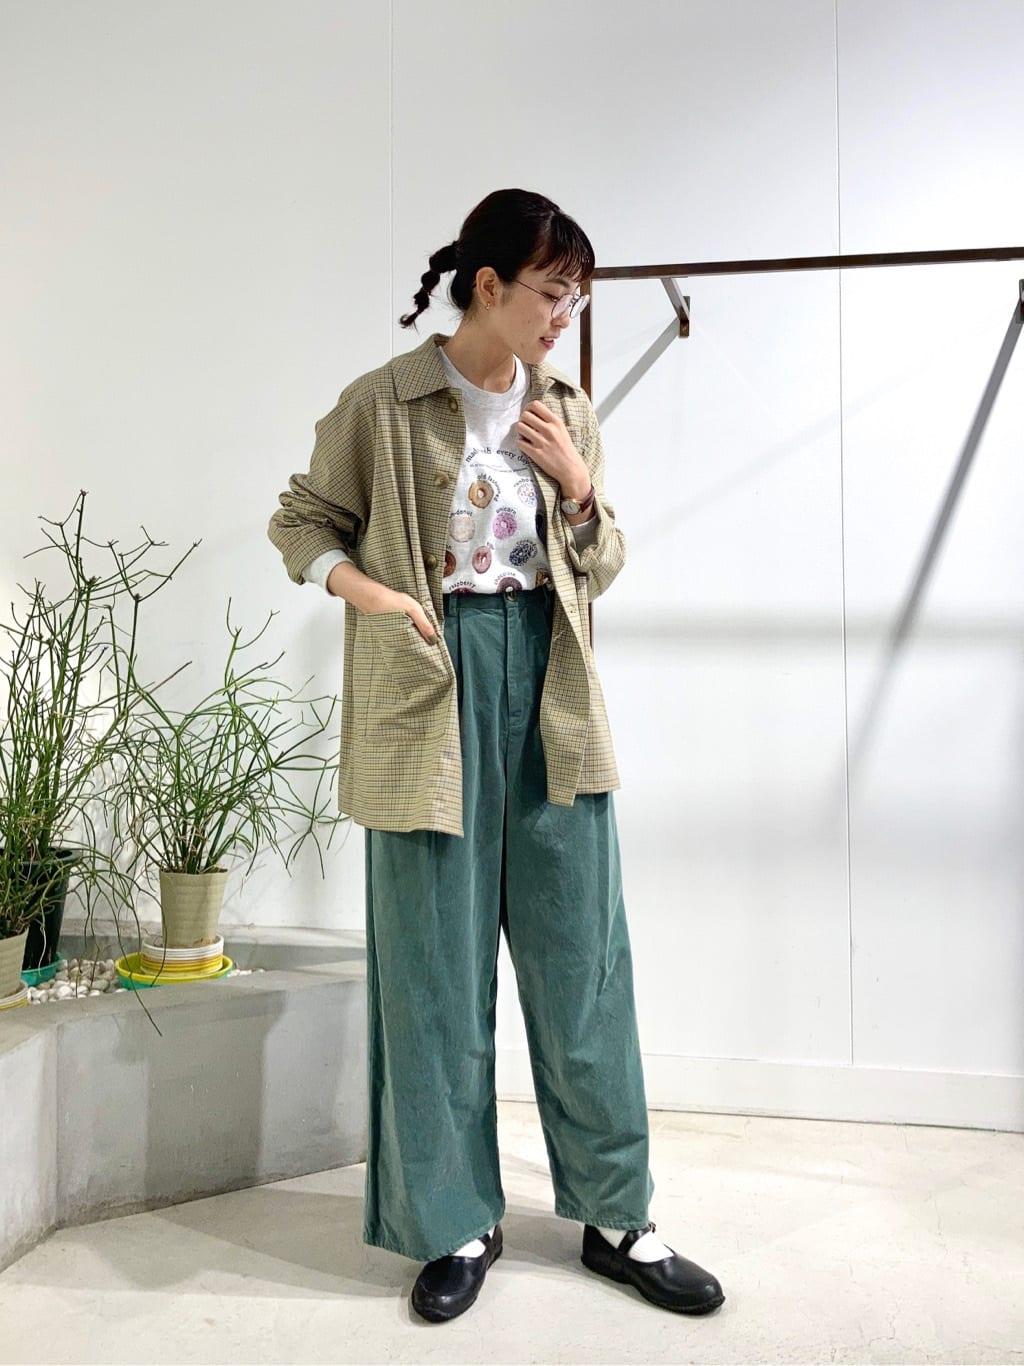 l'atelier du savon 名古屋栄路面 身長:161cm 2021.09.05